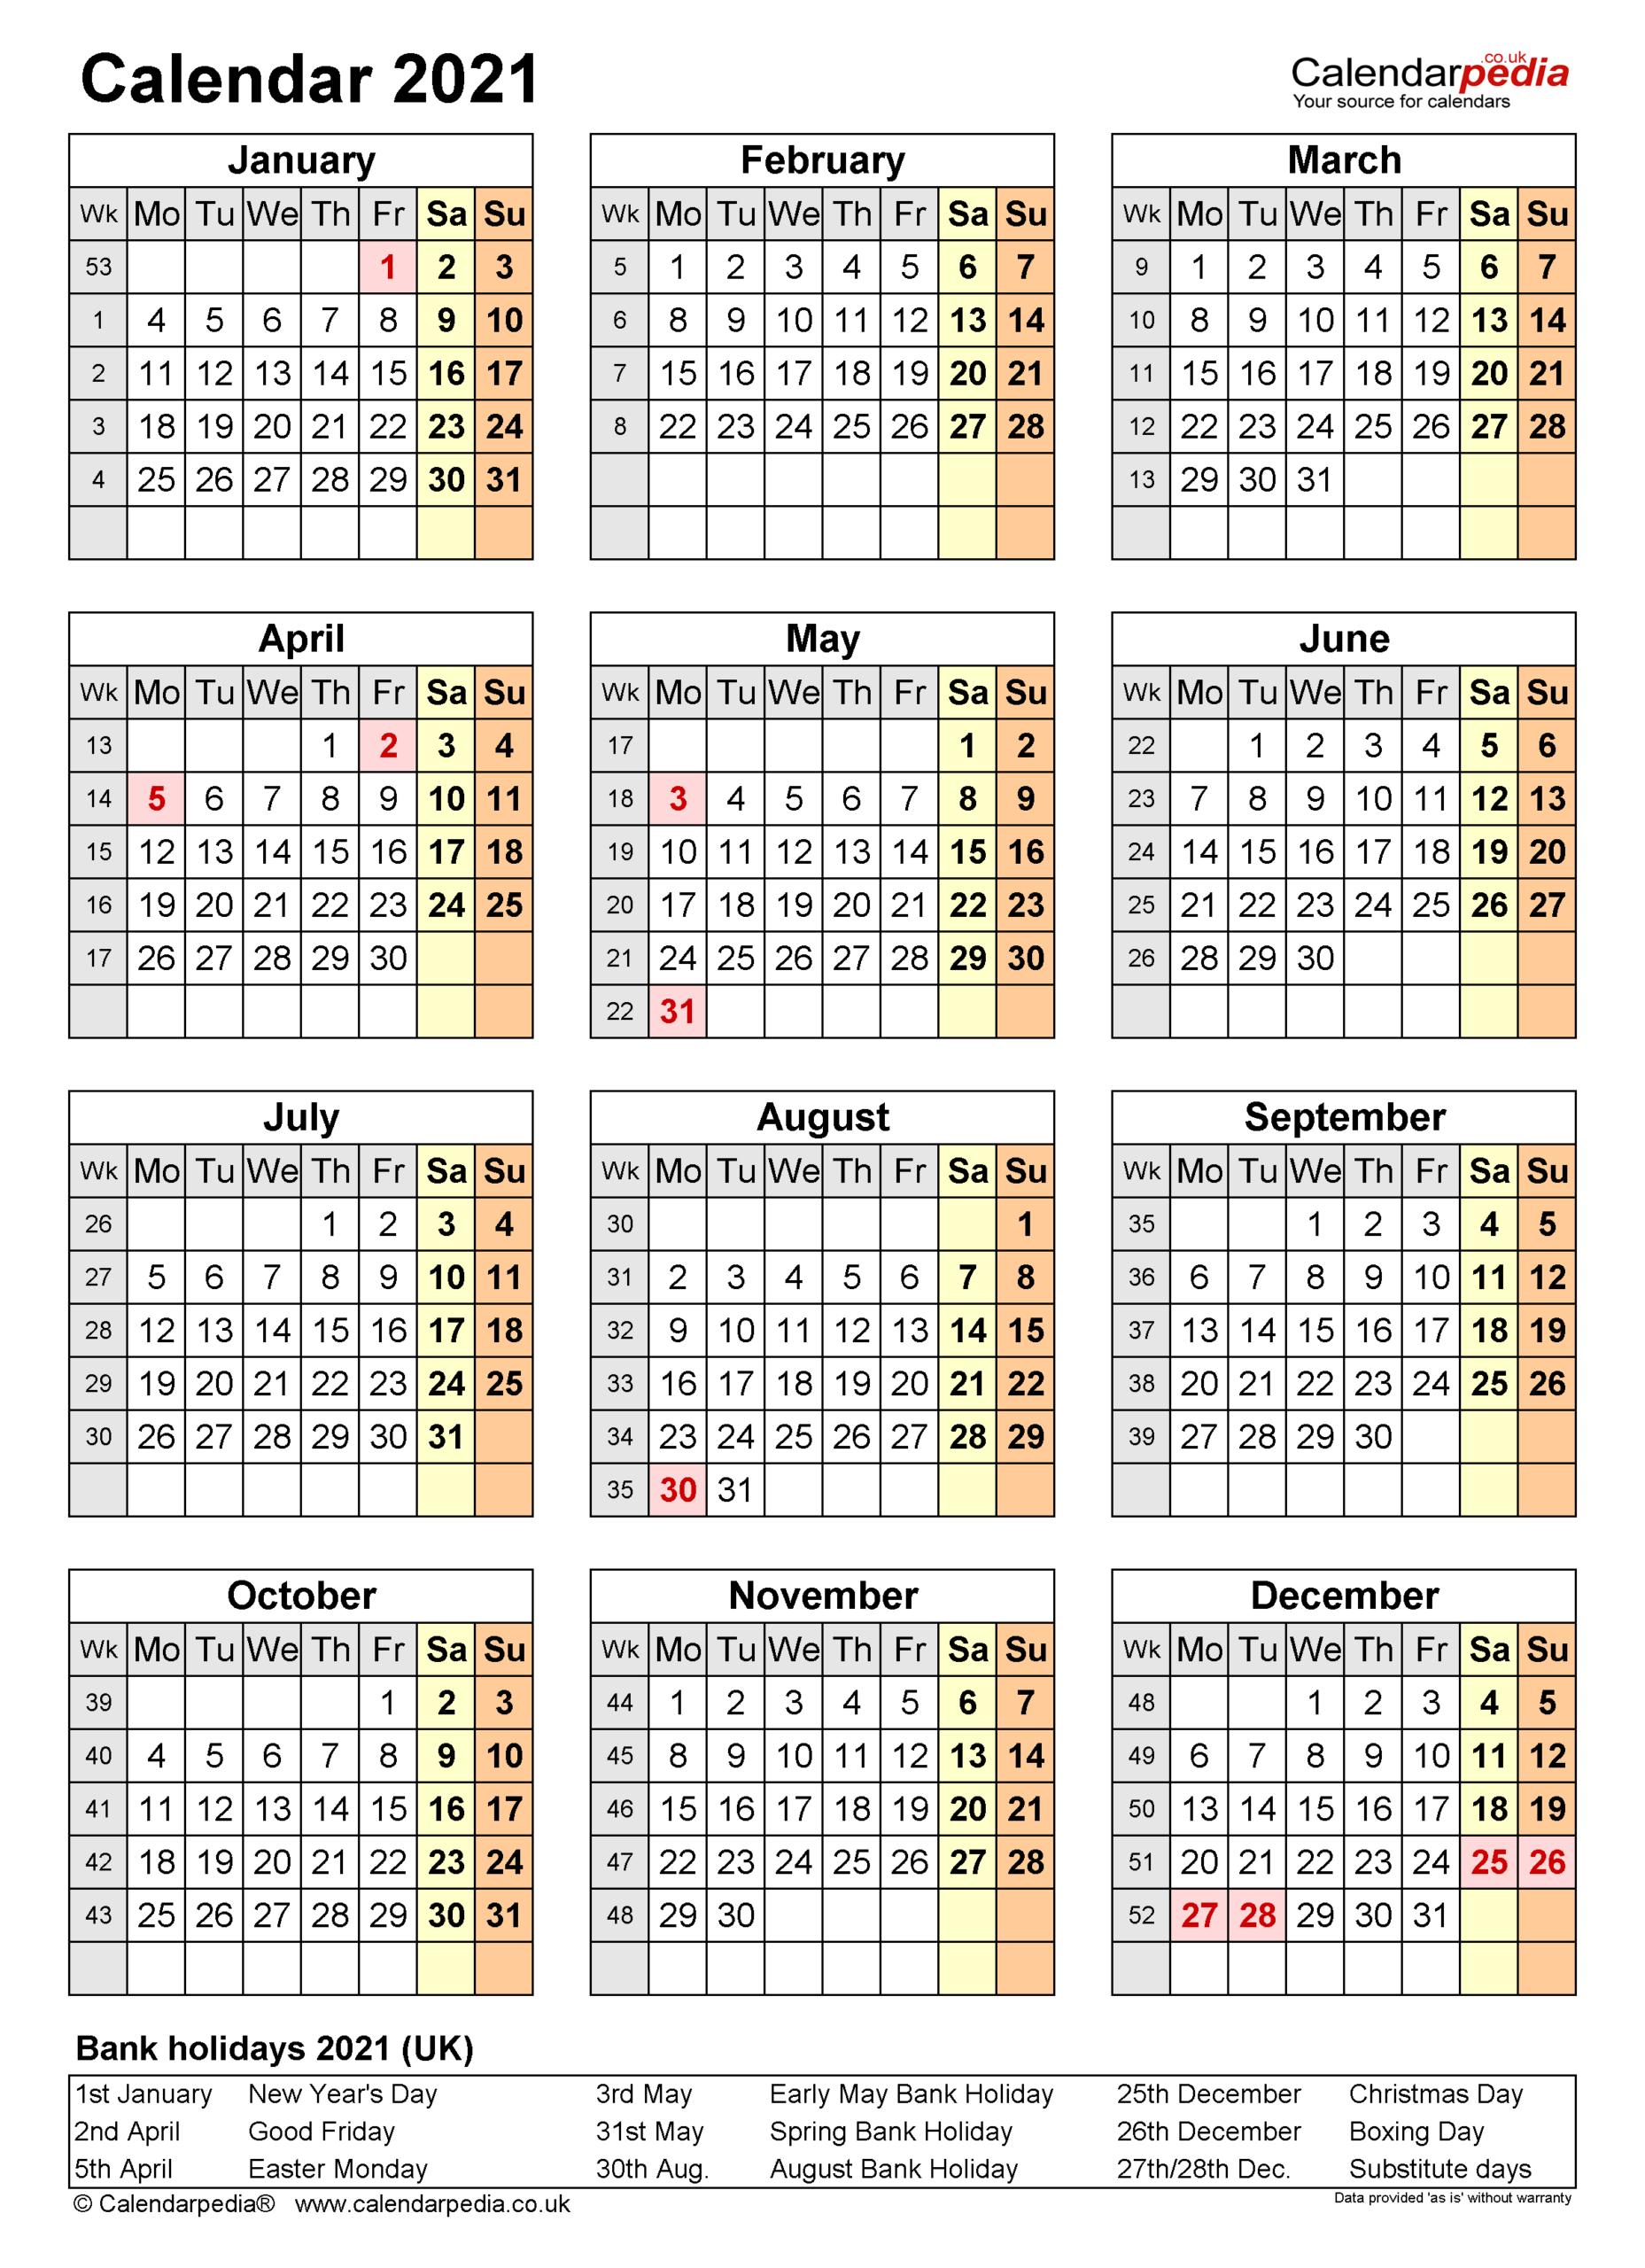 Calendar 2021 (Uk) - Free Printable Microsoft Word Templates